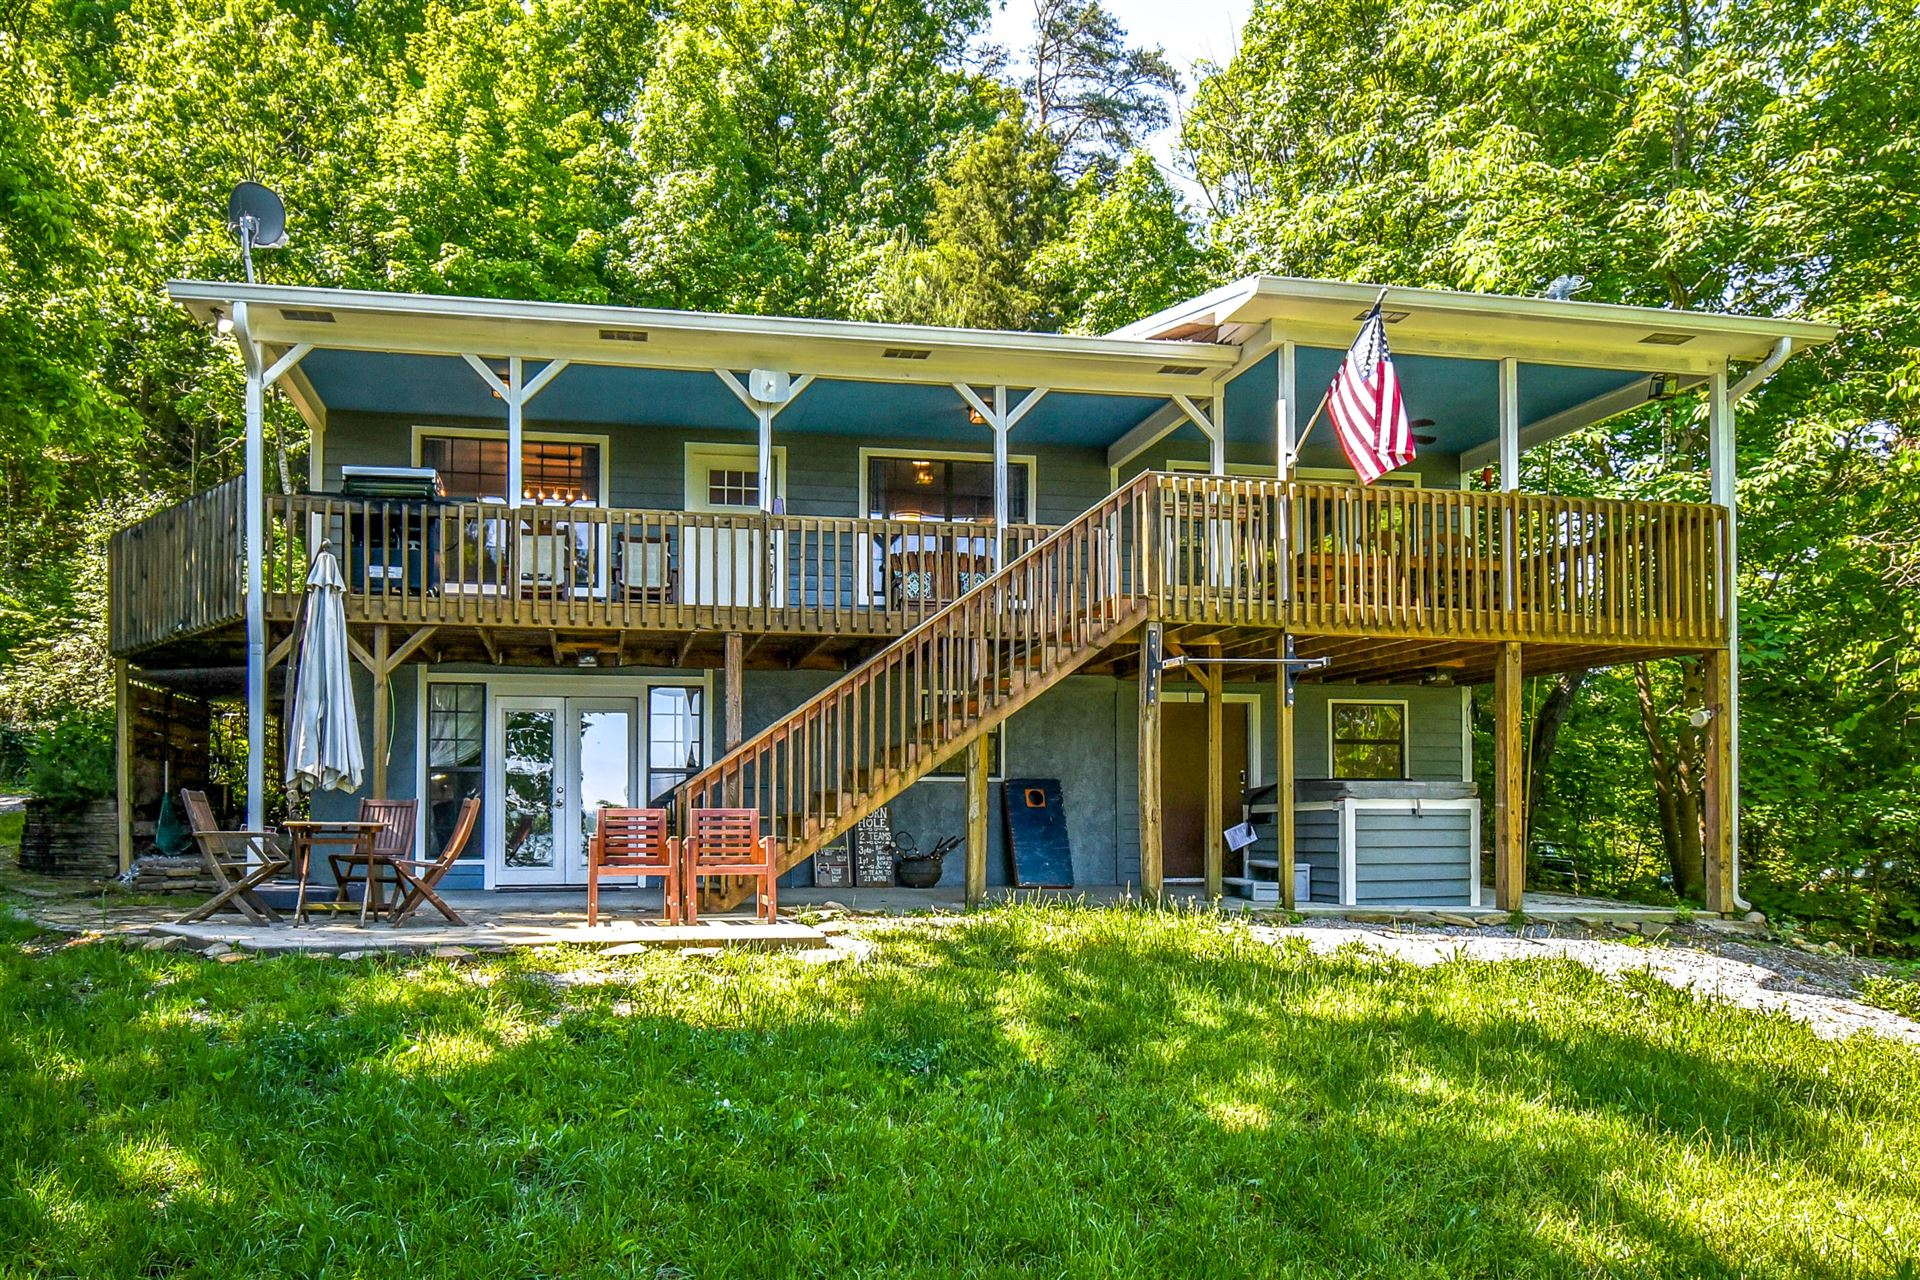 Photo for 2115 Muddy Creek Rd, Dandridge, TN 37725 (MLS # 1116257)